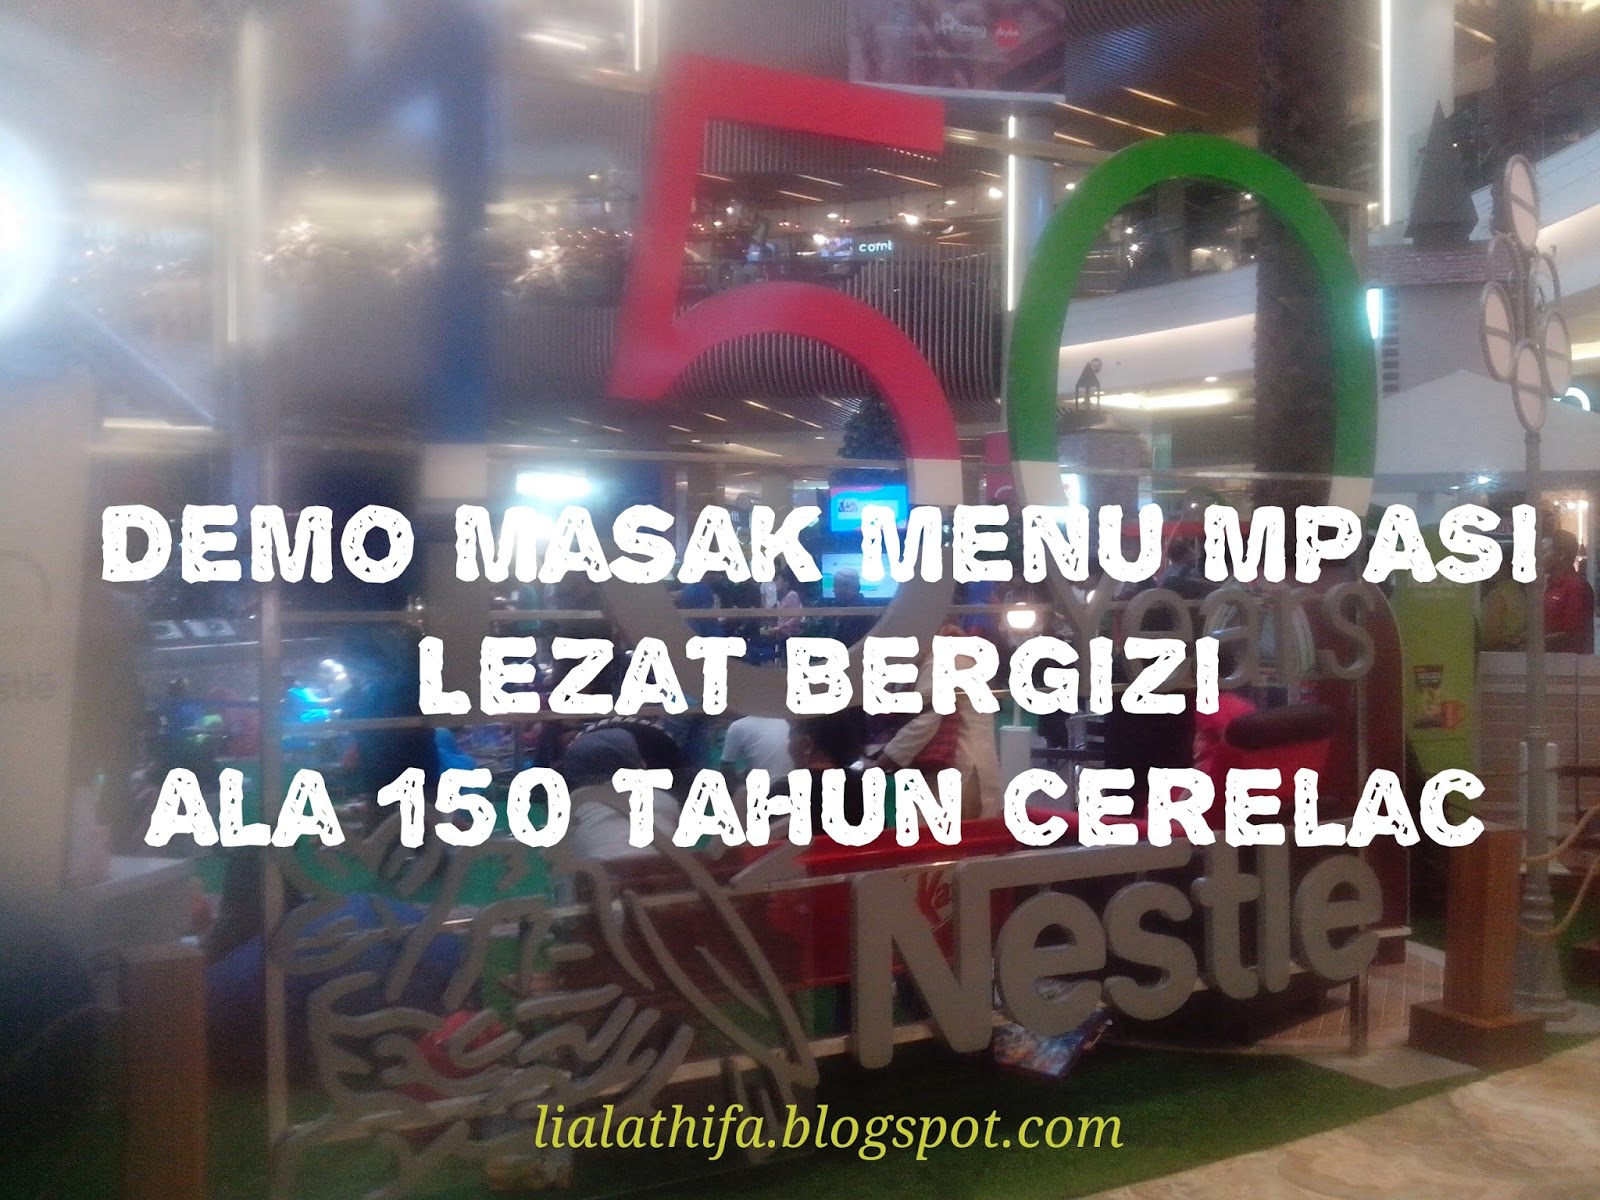 Demo Masak Menu MPASI Lezat Bergizi Ala 150 Tahun Cerelac